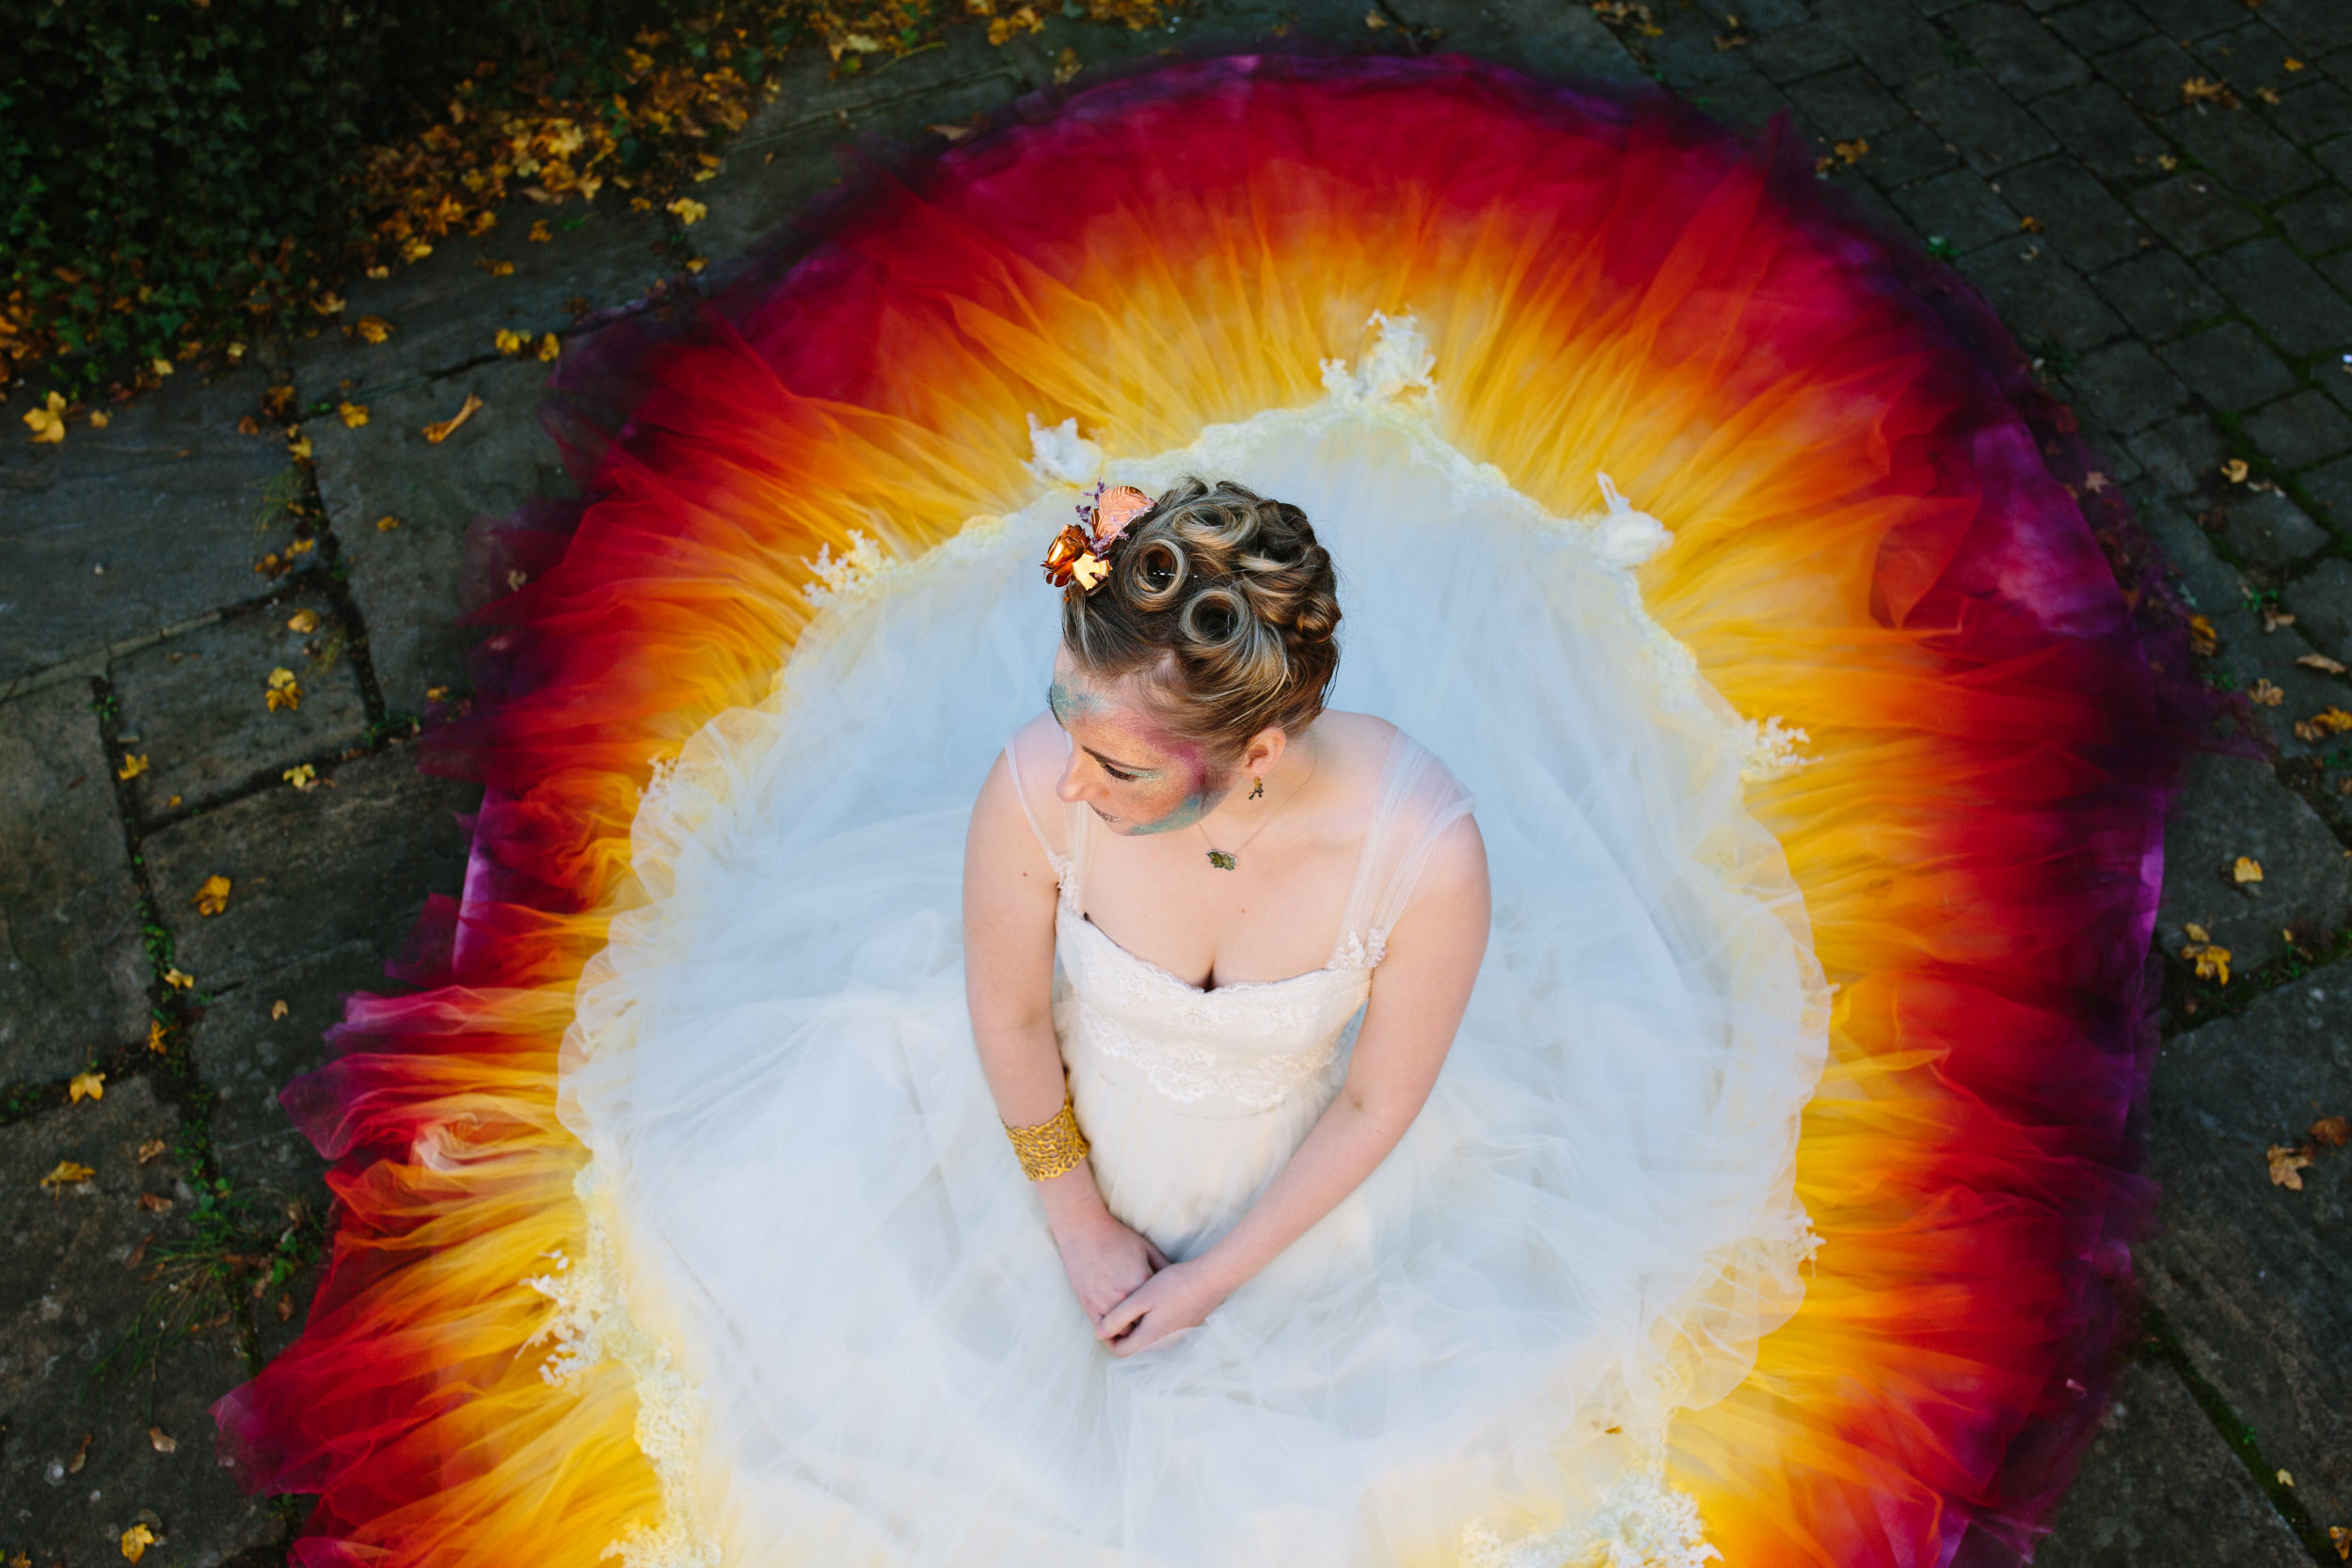 ombre wedding dress - dip dye wedding dress - alternative wedding dress - unique bridal wear - colourful wedding dress